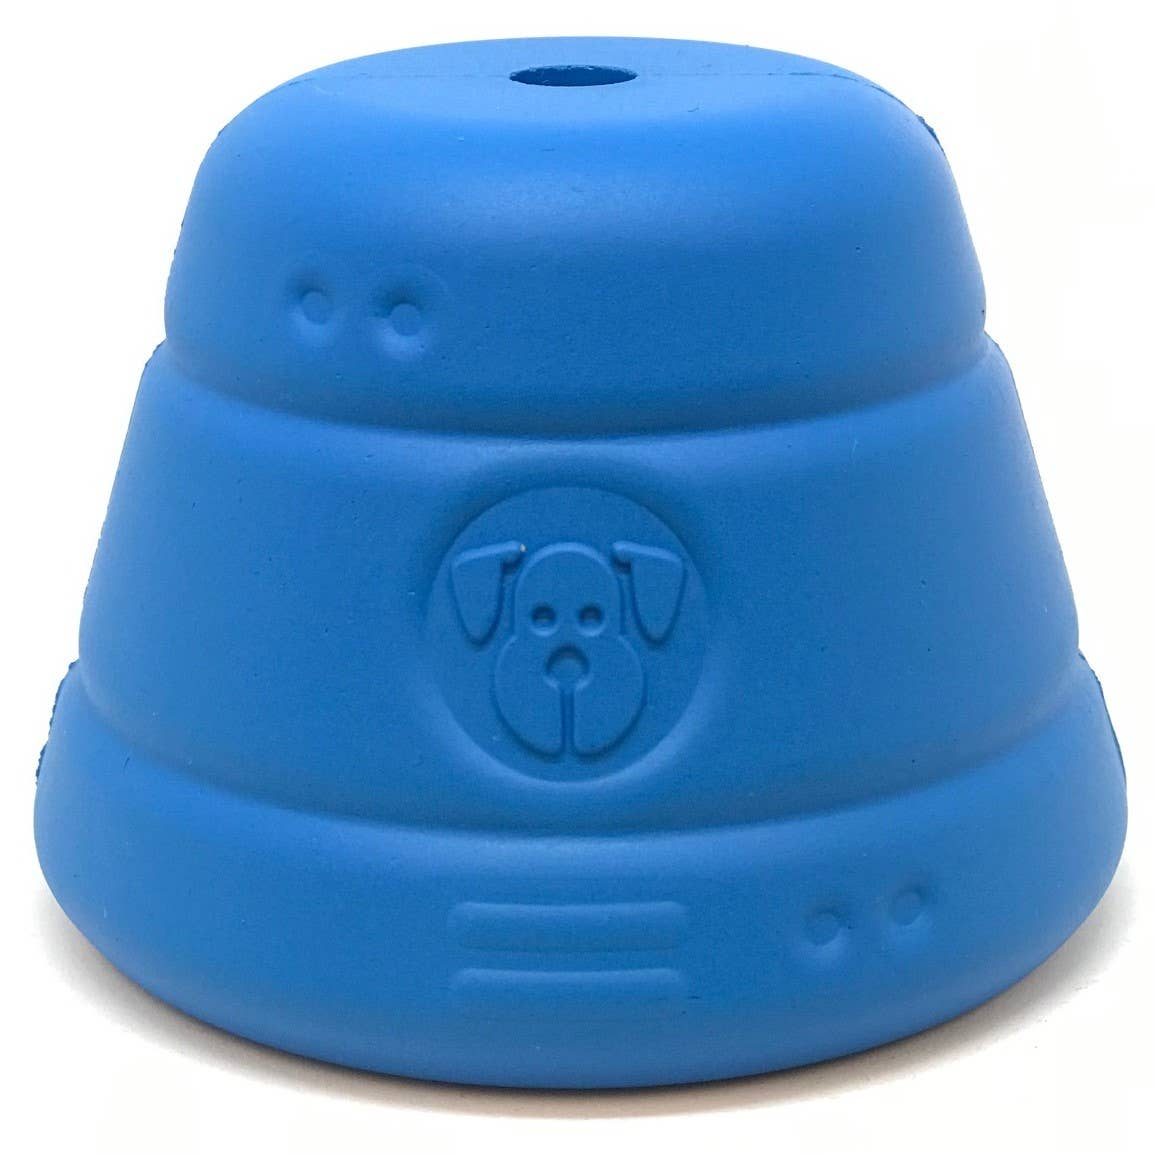 Spotnik Space Capsule -Chew Toy-Treat Dispenser-Large-Blue   Trada Marketplace